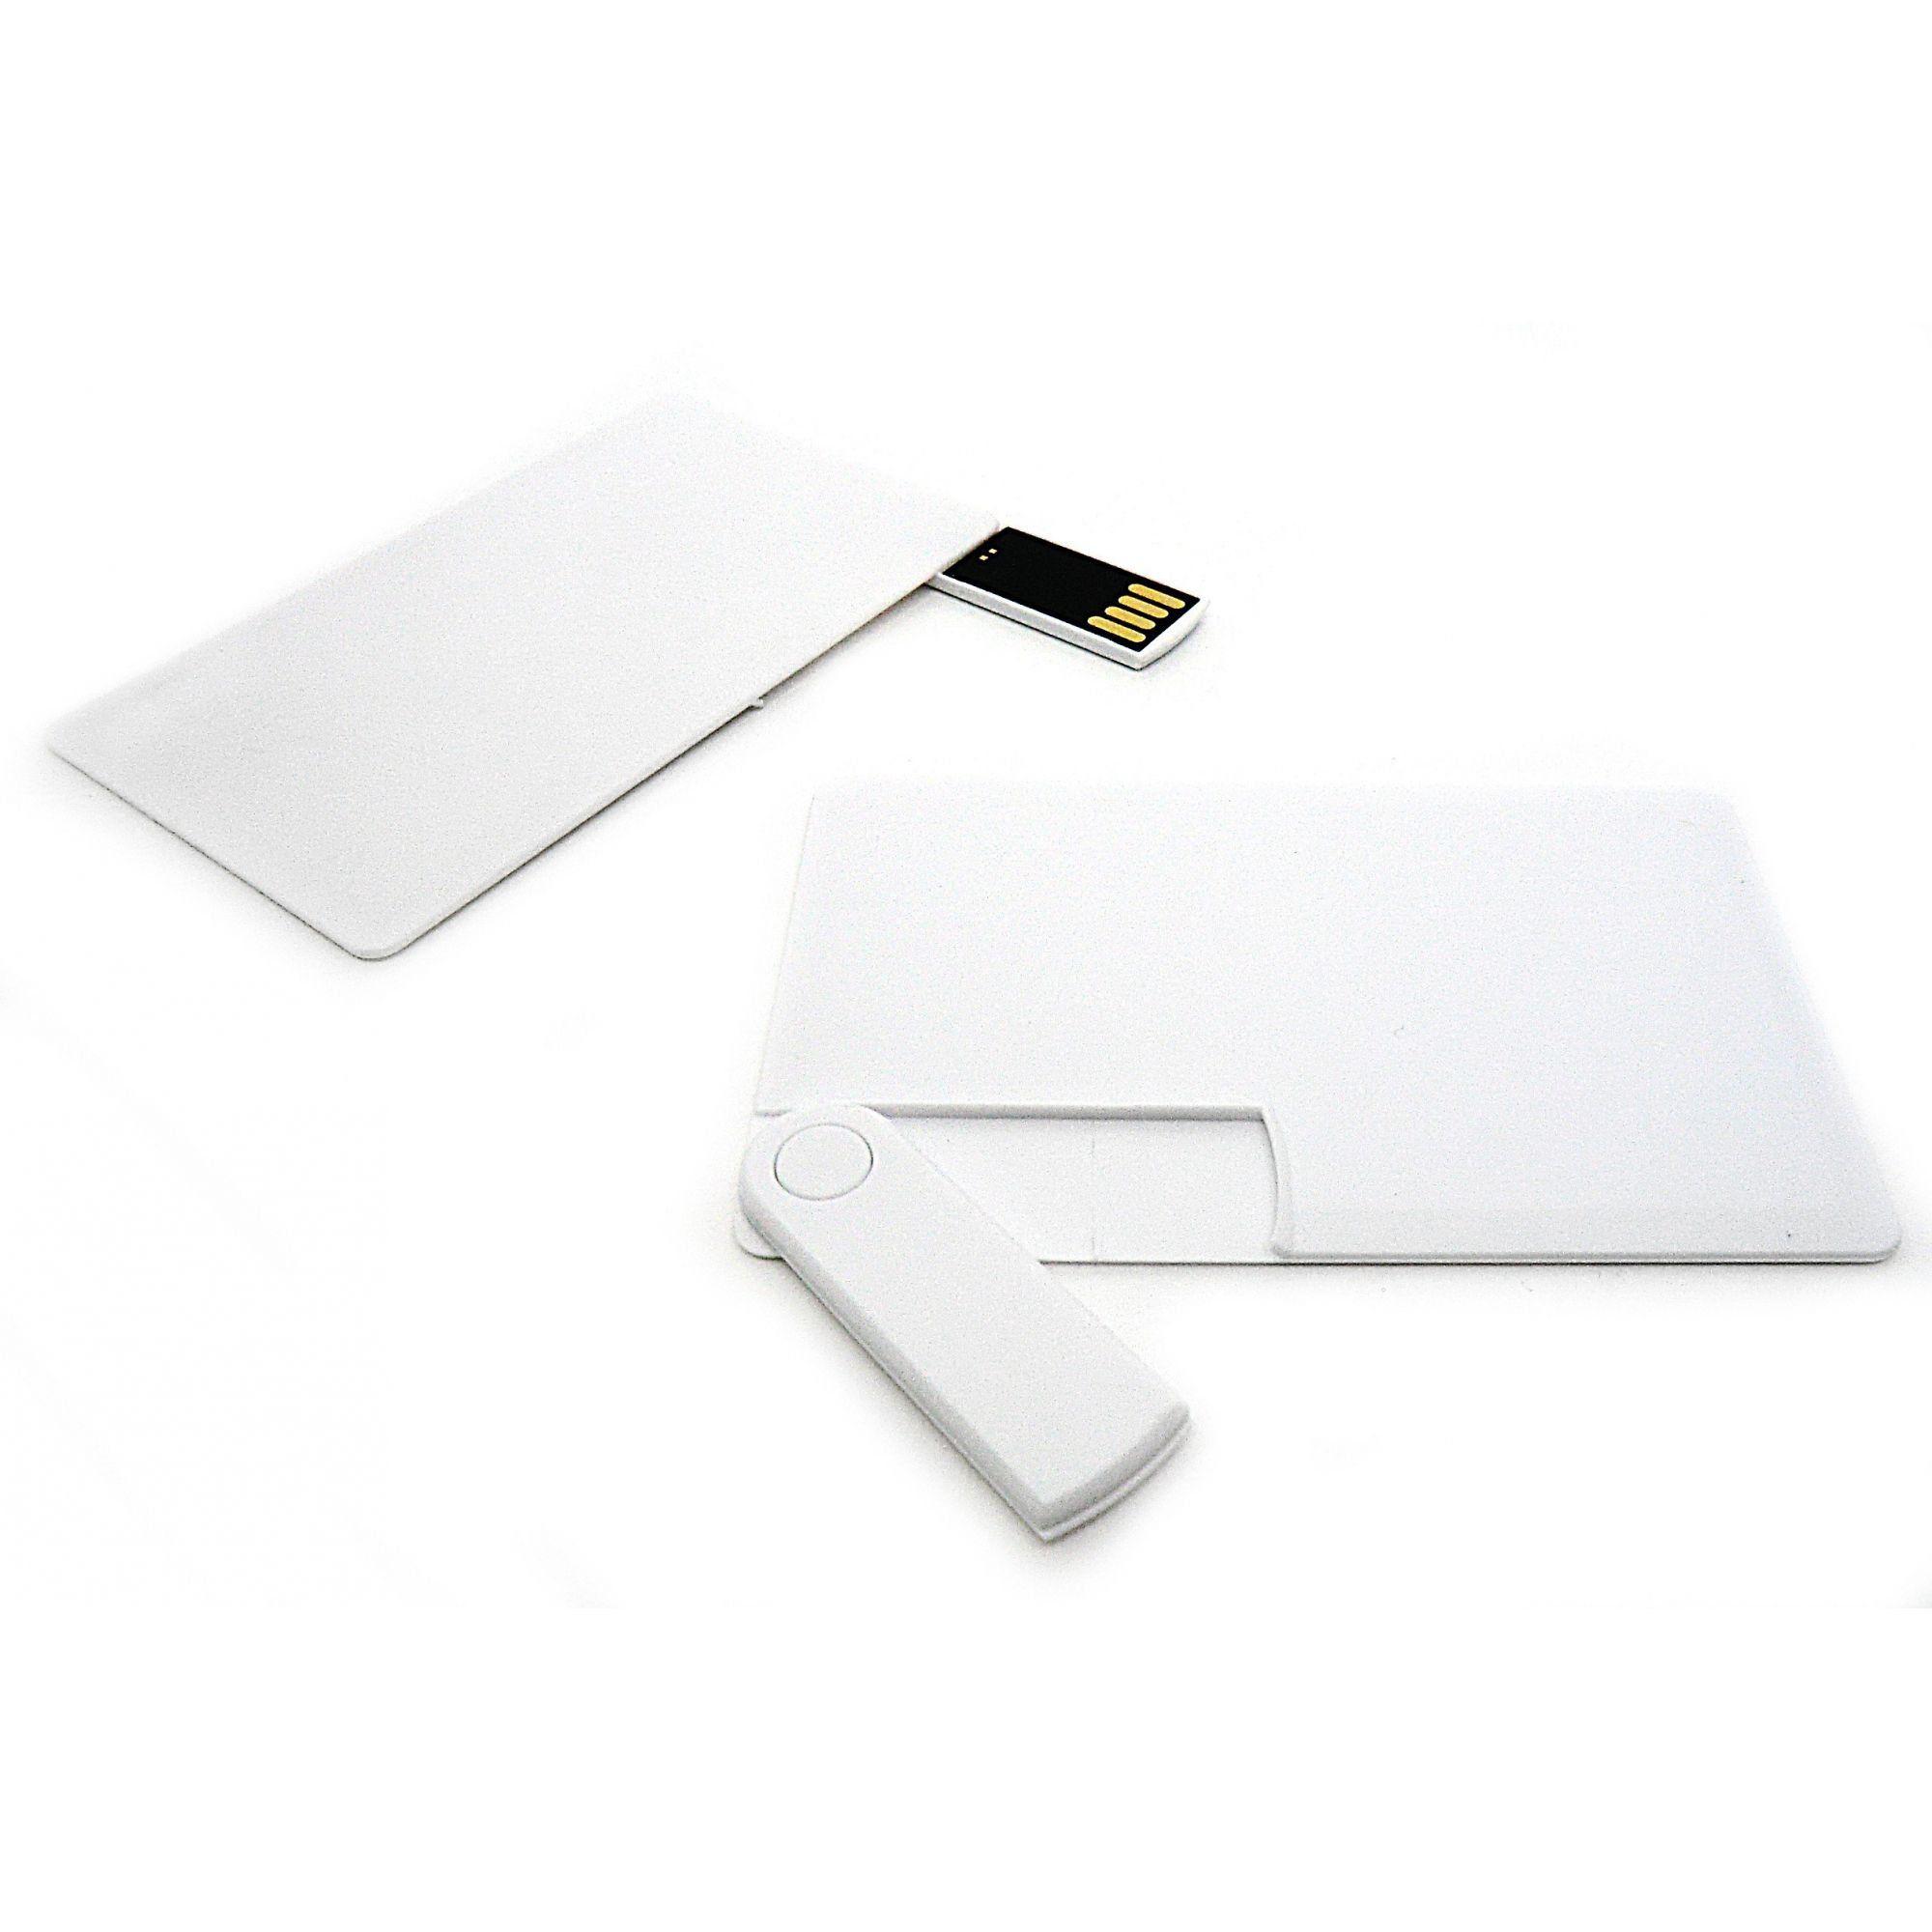 Pen Card 4GB Plástico Branco Retangular Canivete Personalizado